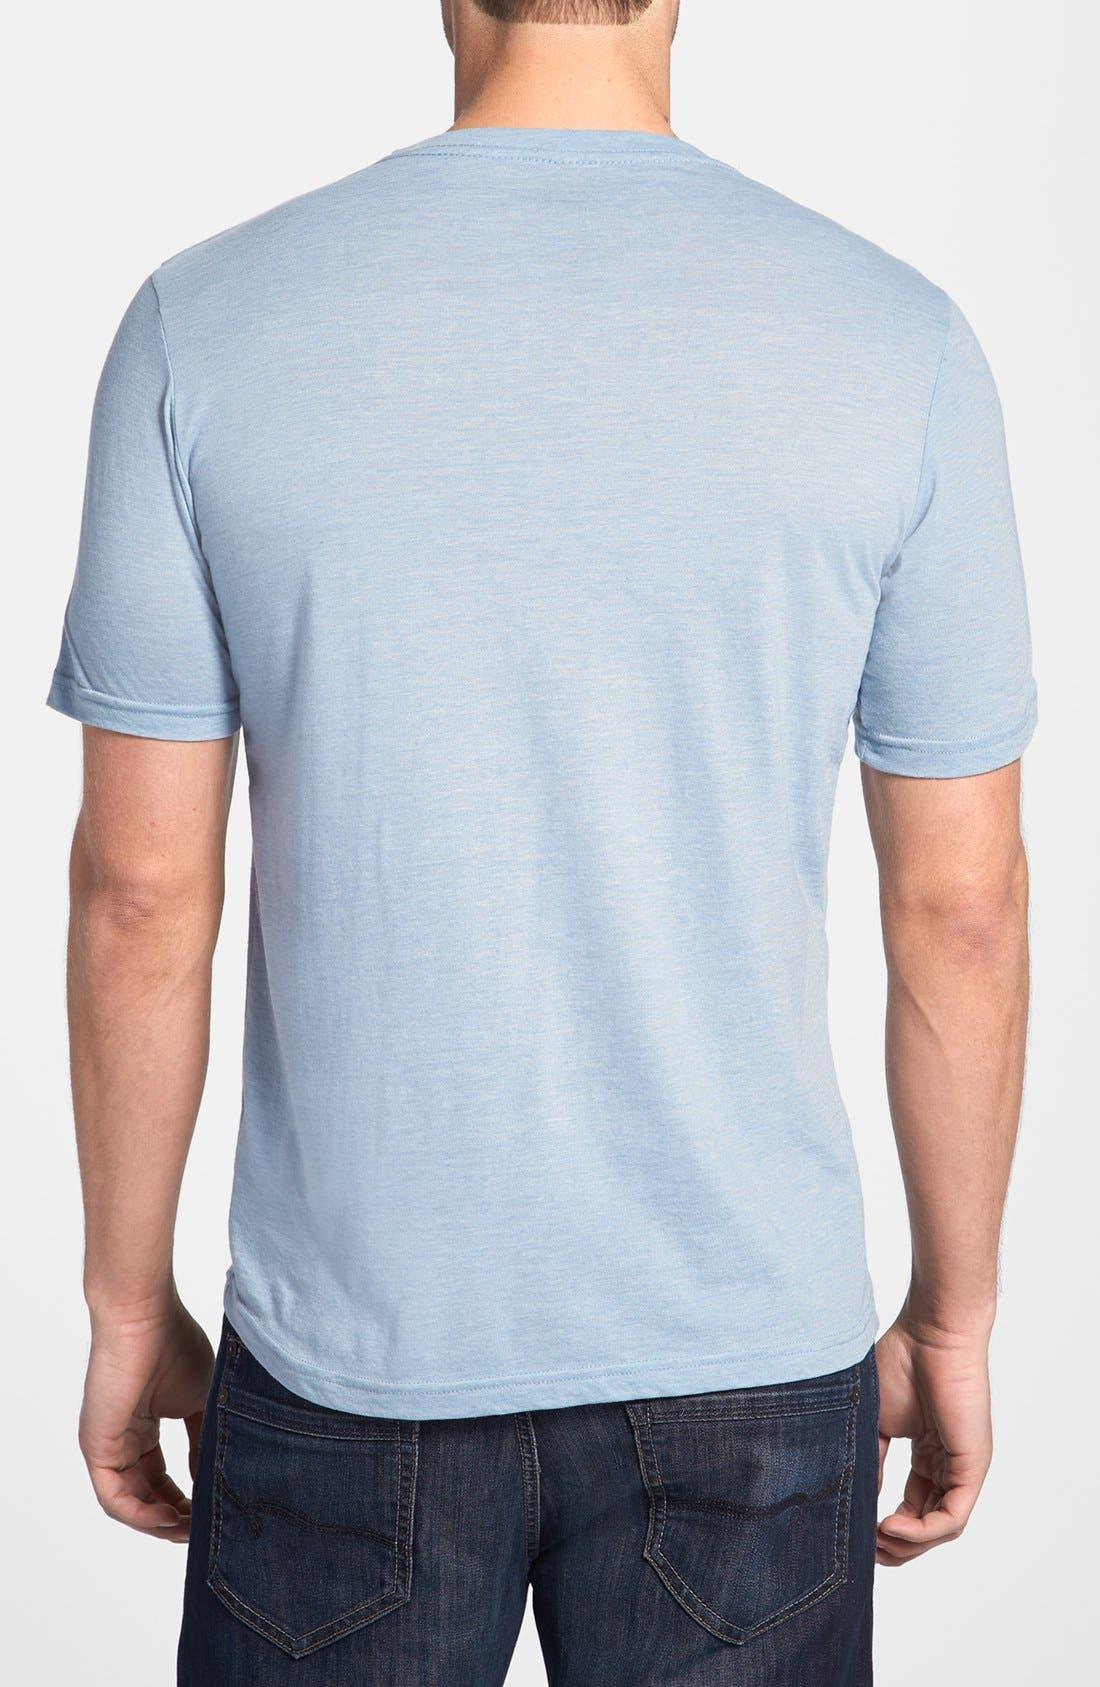 Alternate Image 2  - Bowery Supply 'Sky Birds' Graphic T-Shirt